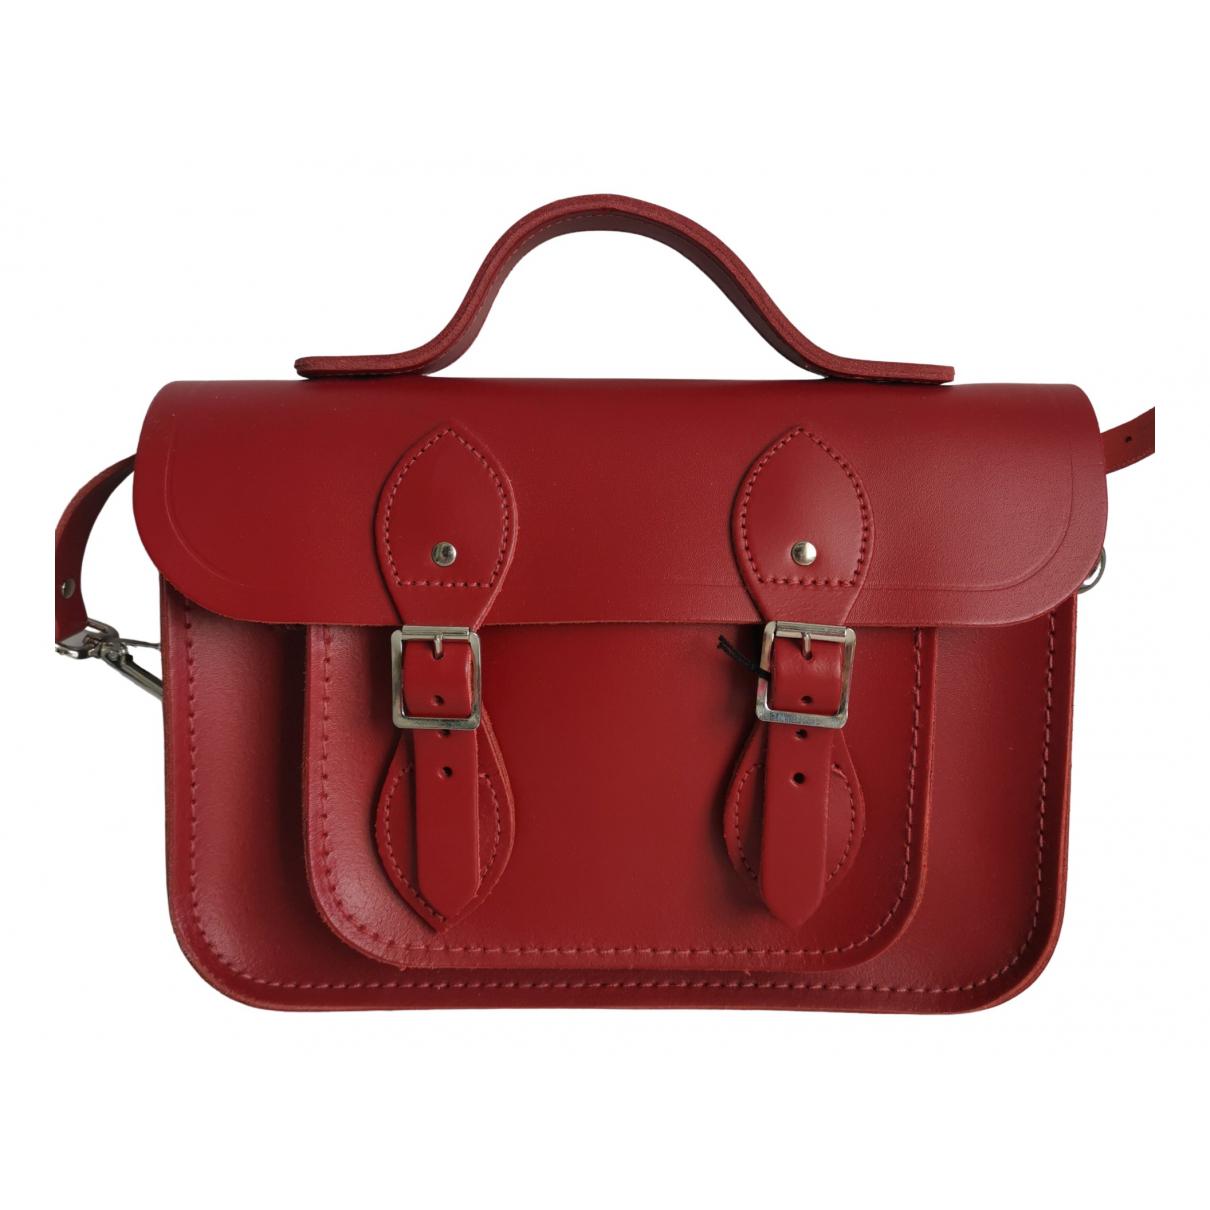 Cambridge Satchel Company \N Red Leather handbag for Women \N